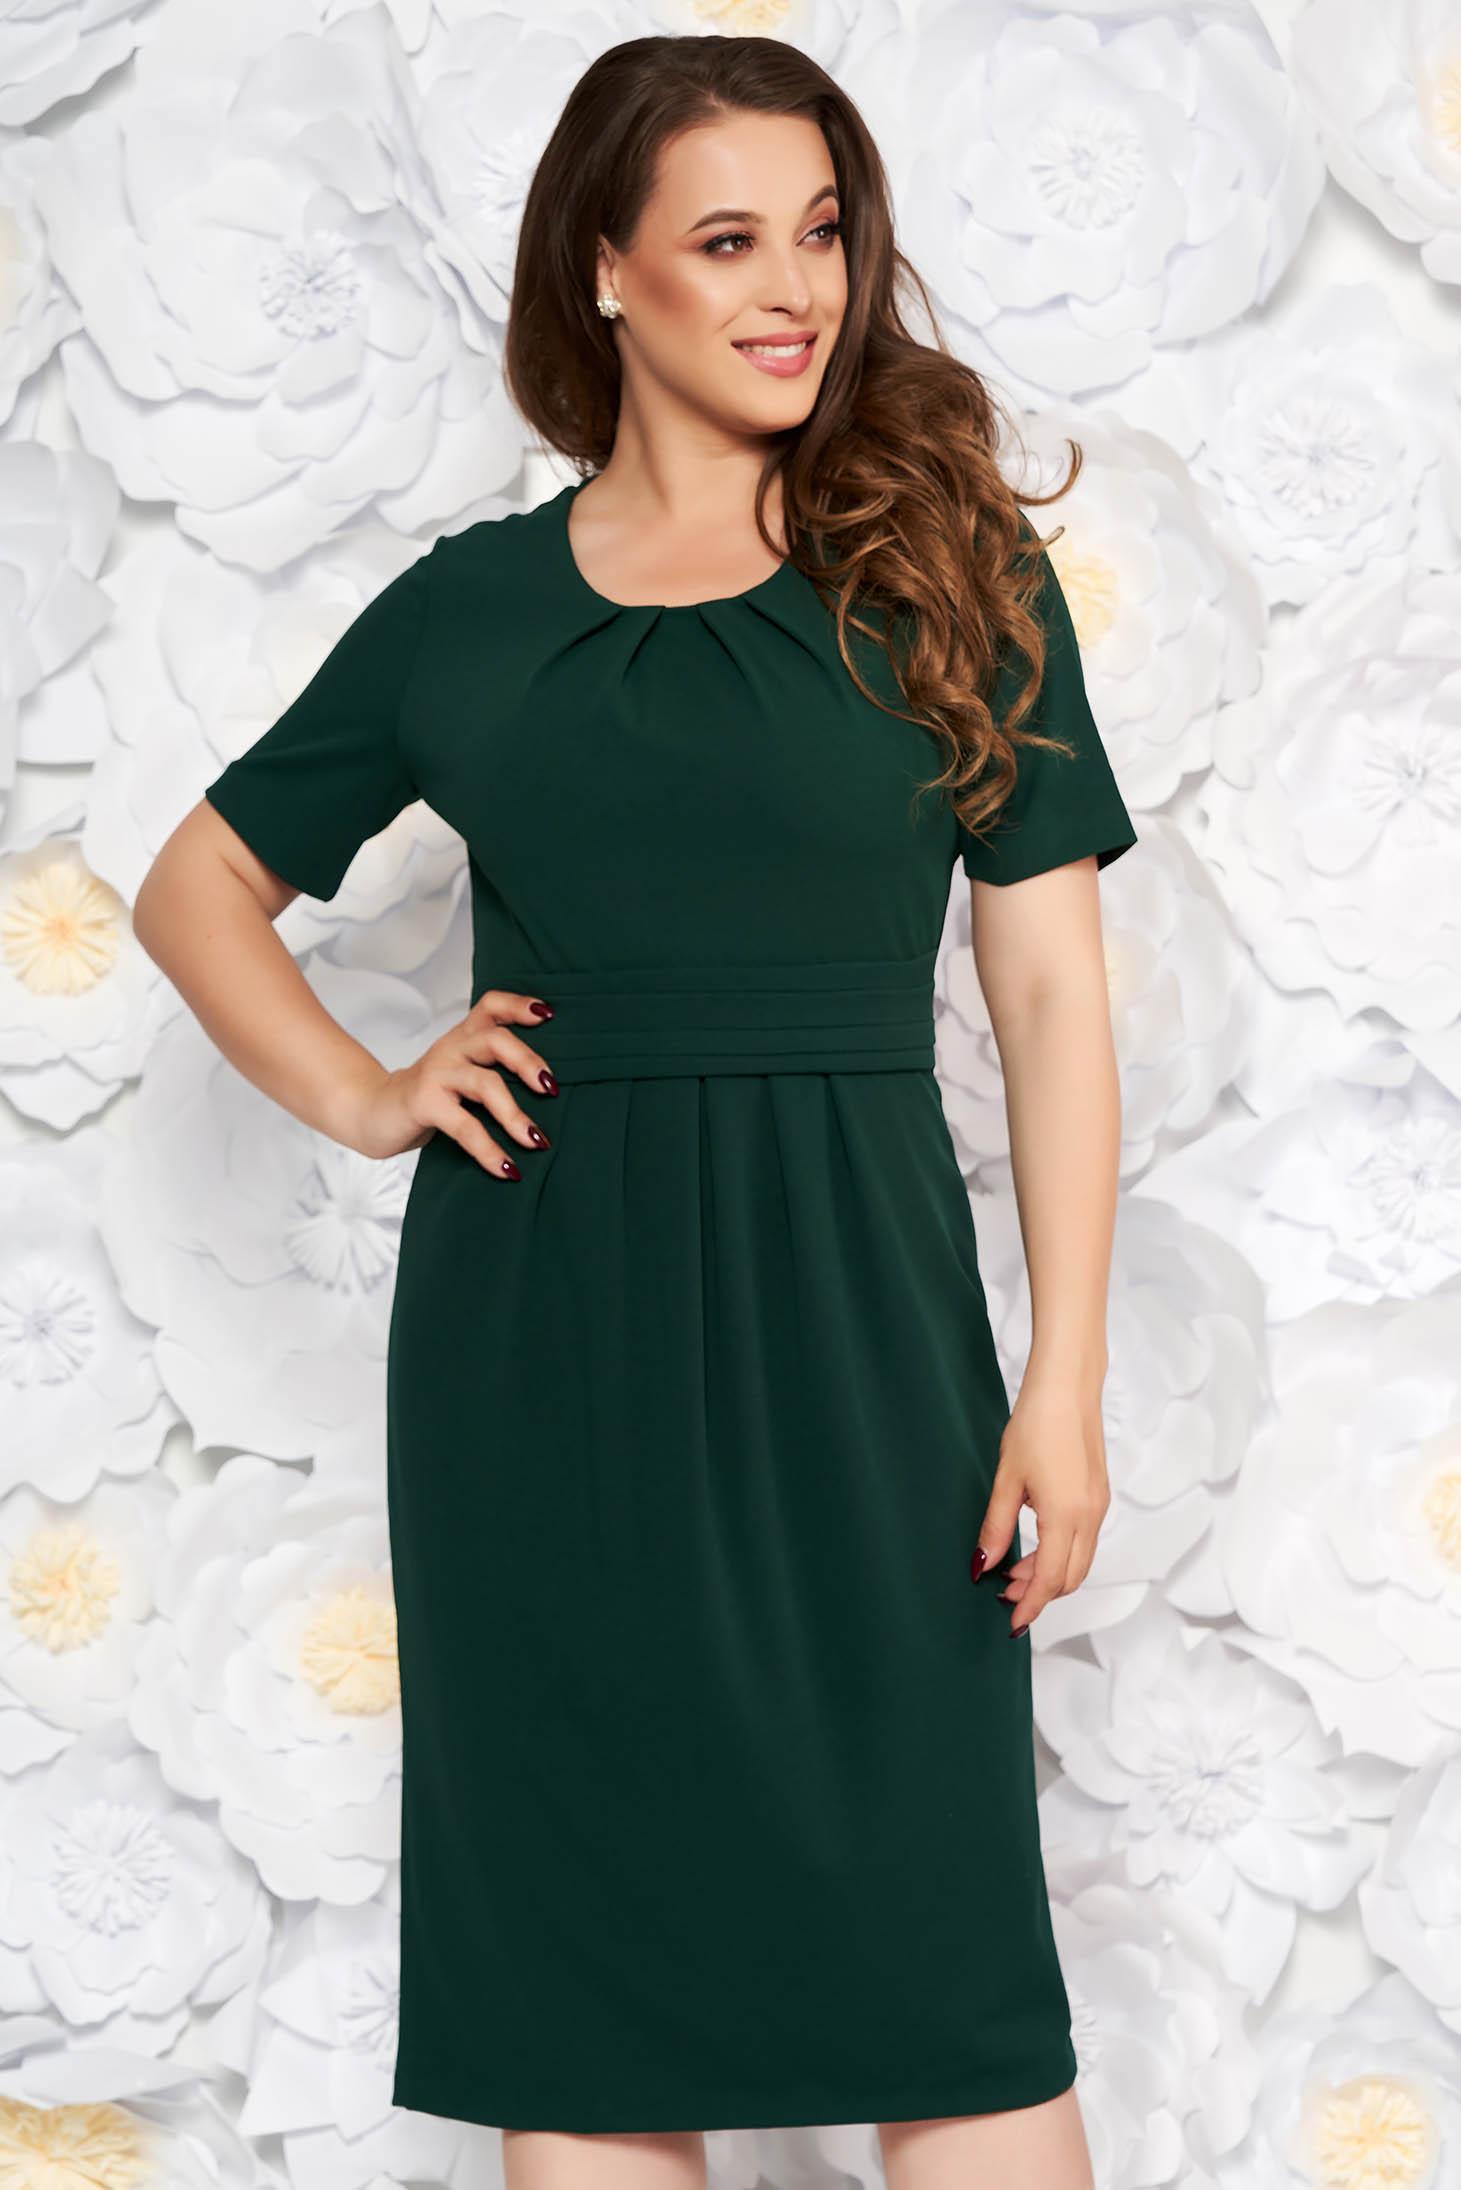 StarShinerS darkgreen office midi pencil dress slightly elastic fabric with inside lining short sleeves